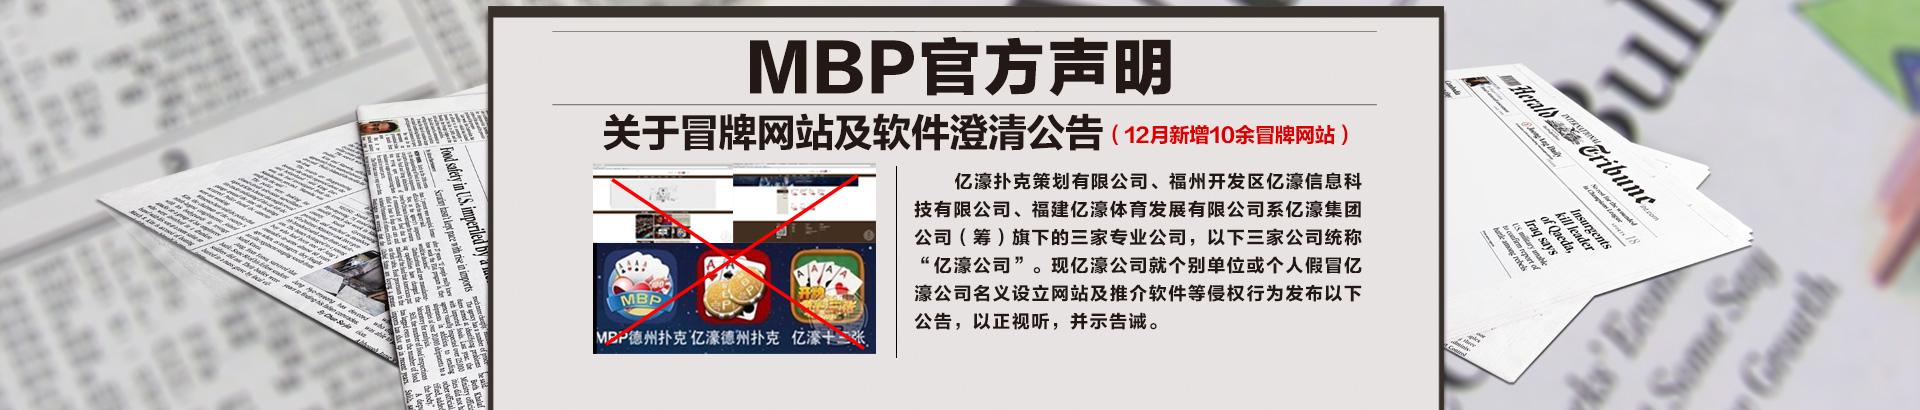 MBP官方声明:关于冒牌网站及软件澄清公告